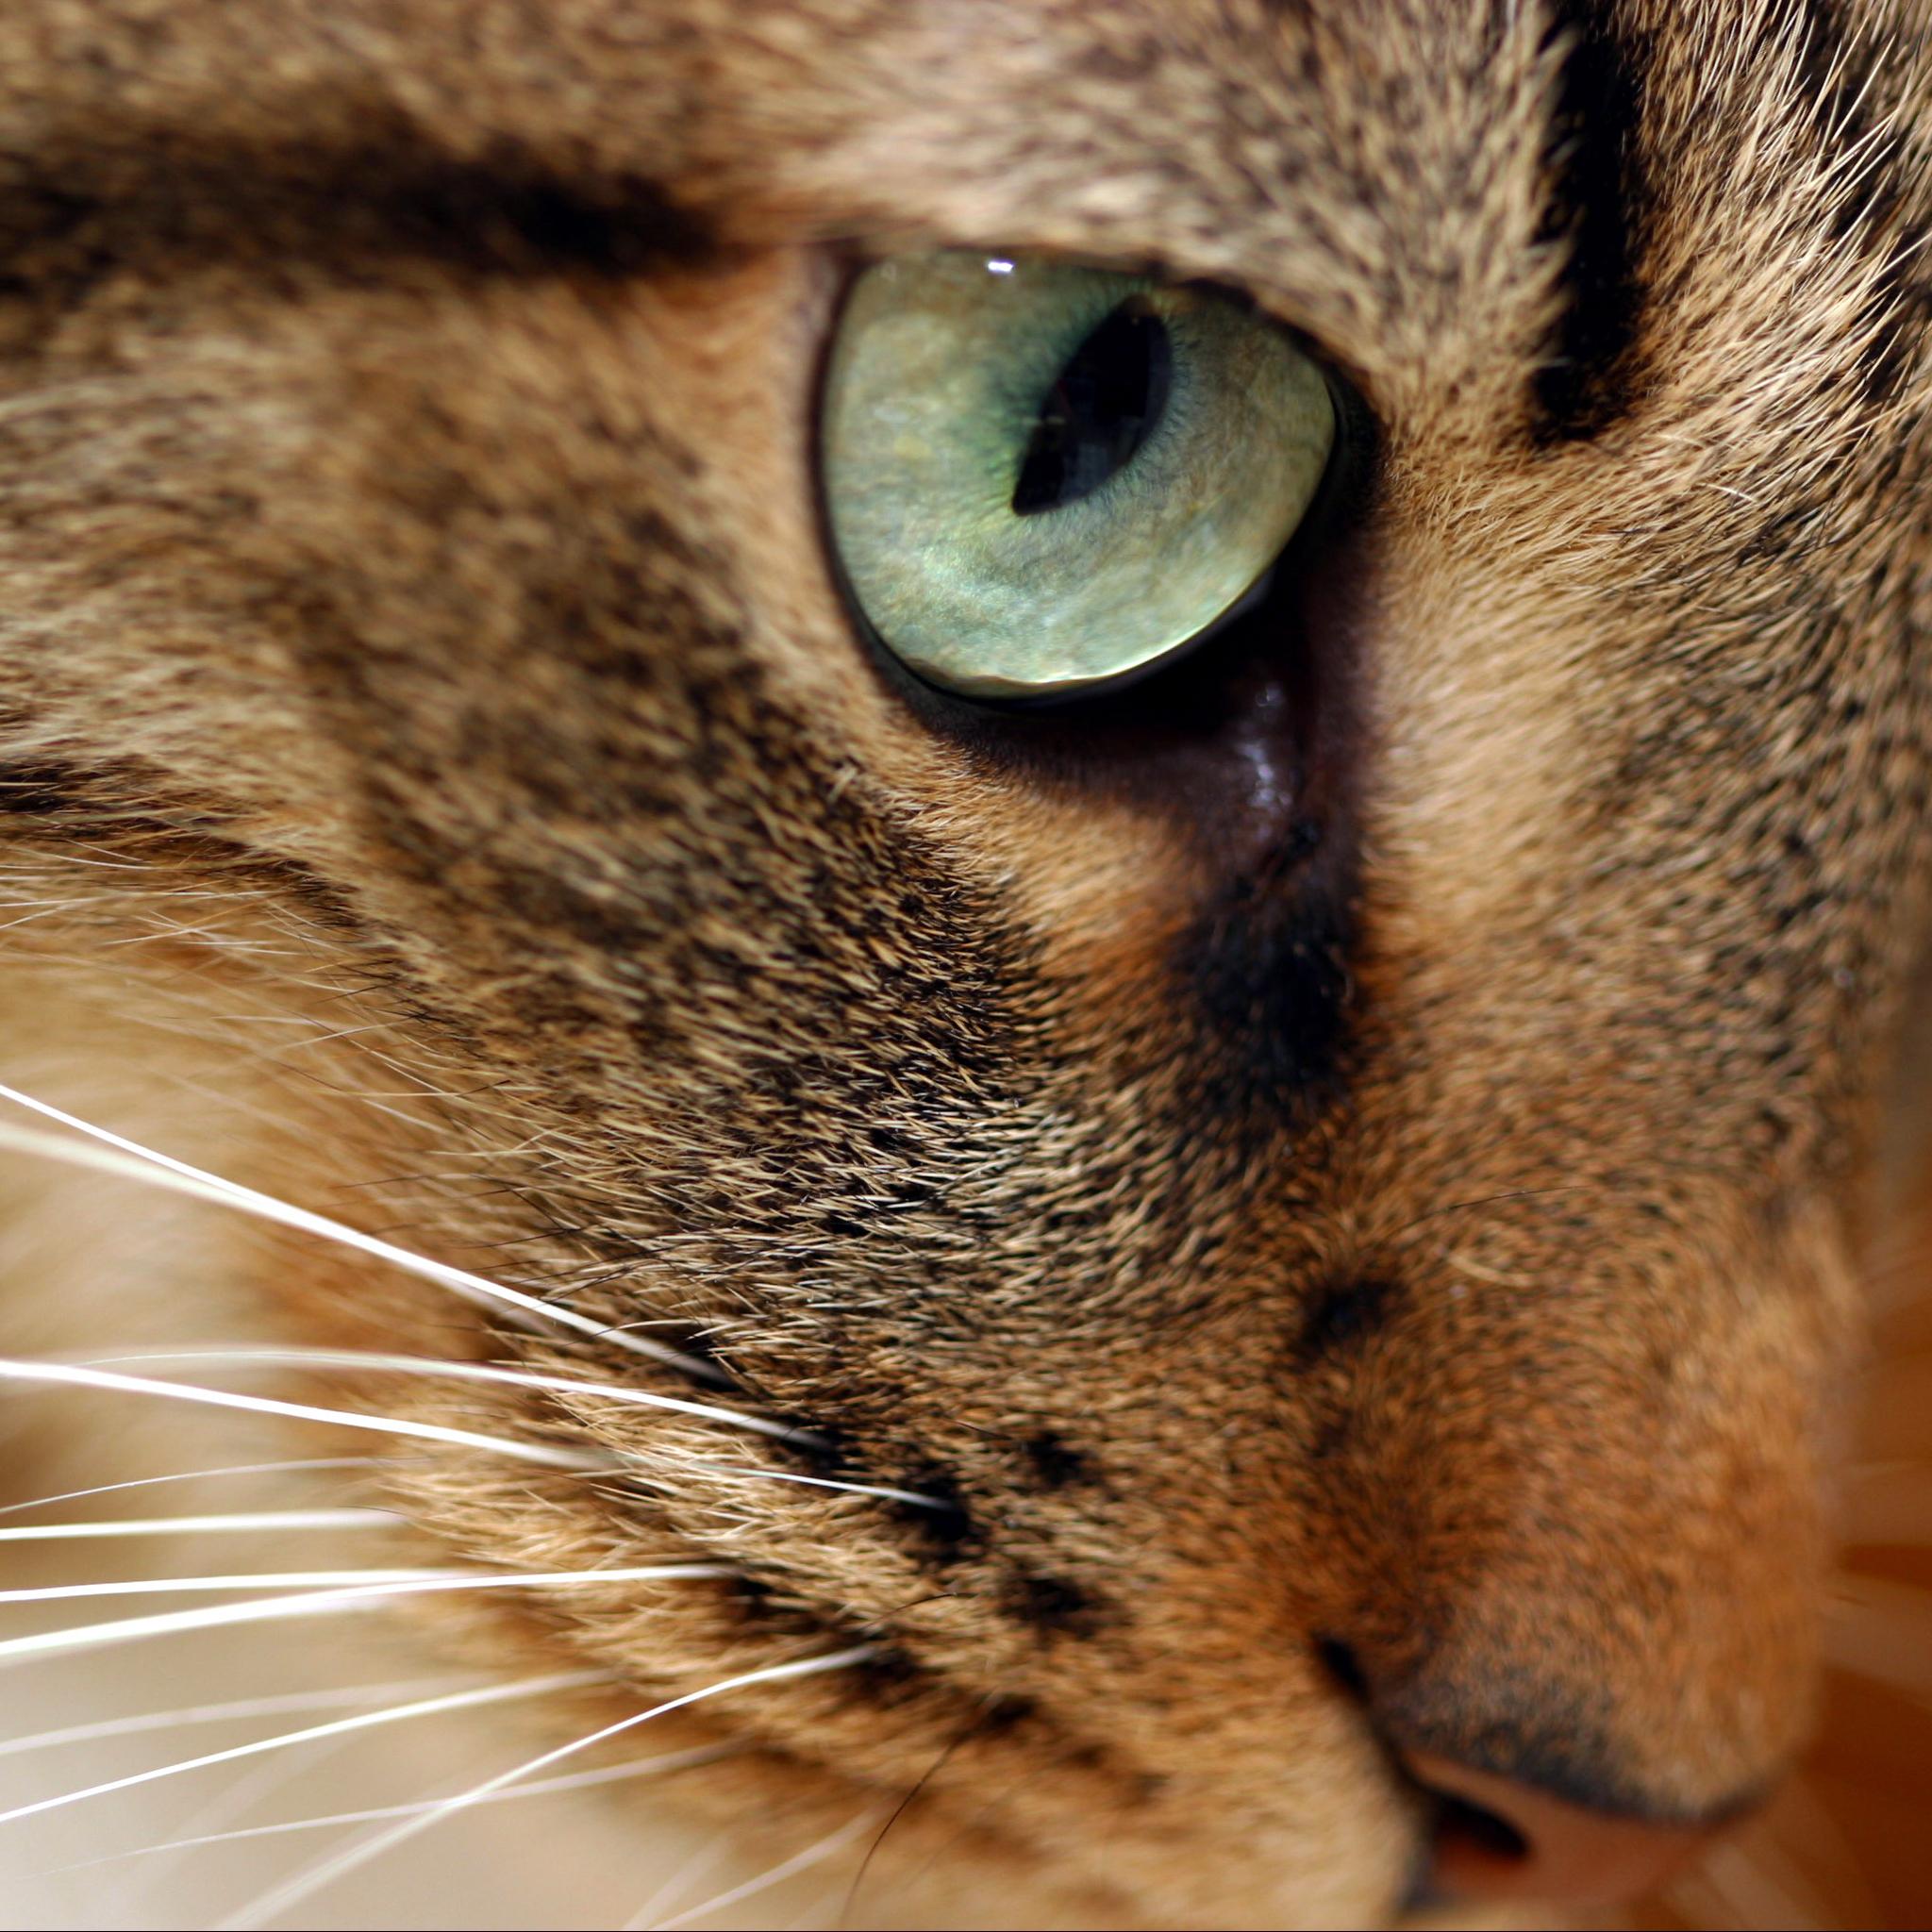 Eyes-Cat-3Wallpapers-iPad